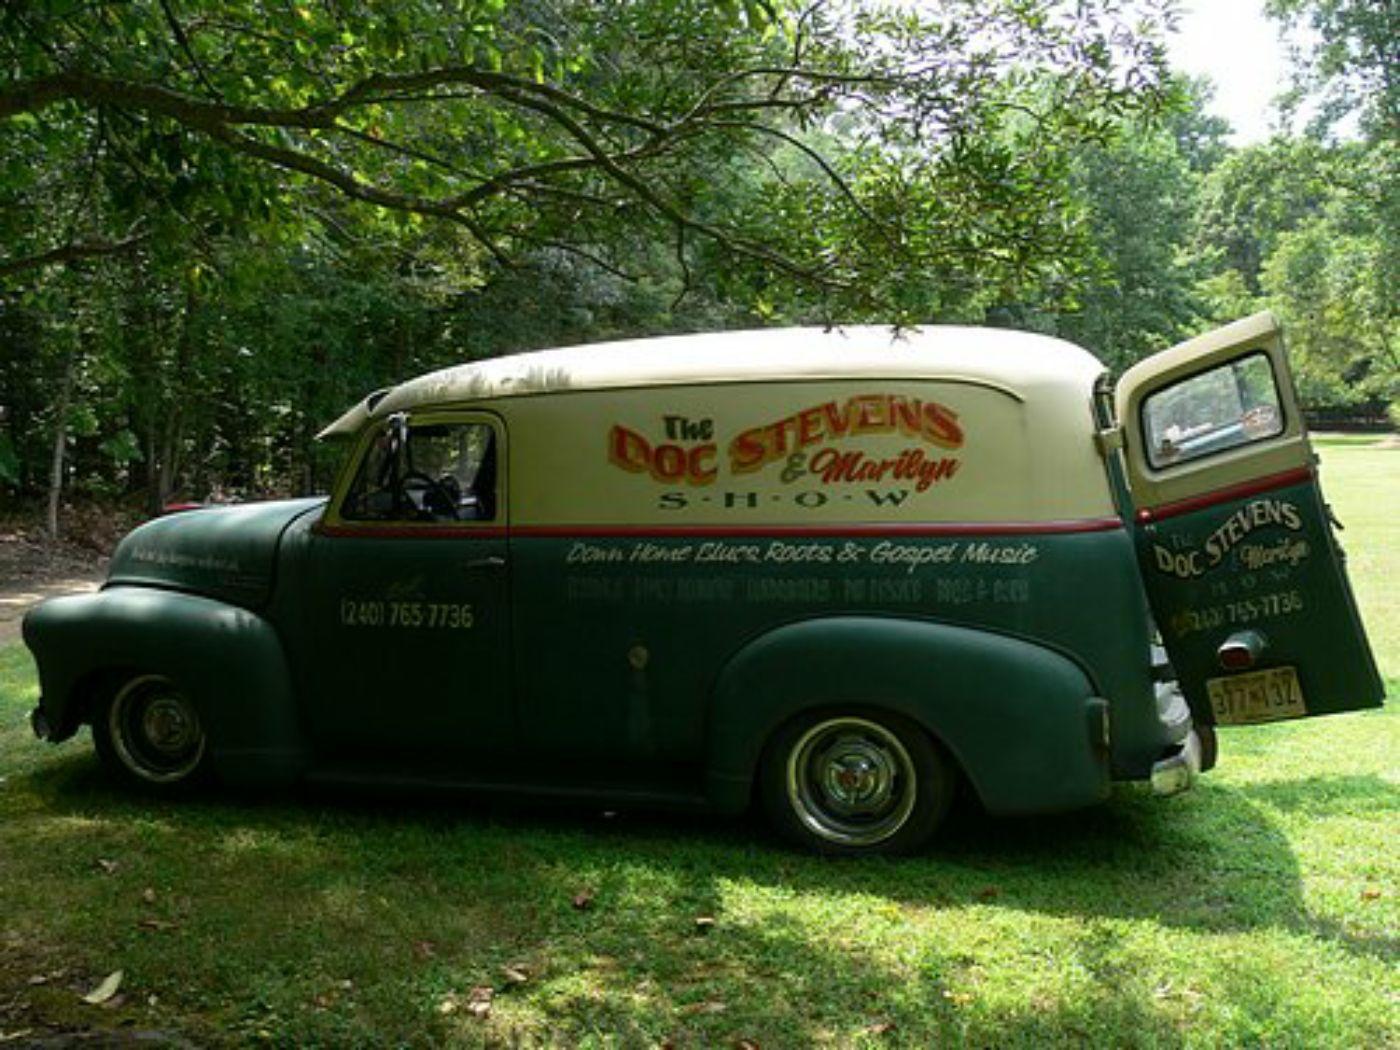 Truck 1949 chevy panel truck : Doc Stevens' Barn Find 51 Chevy Panel Truck. Channeled over full ...